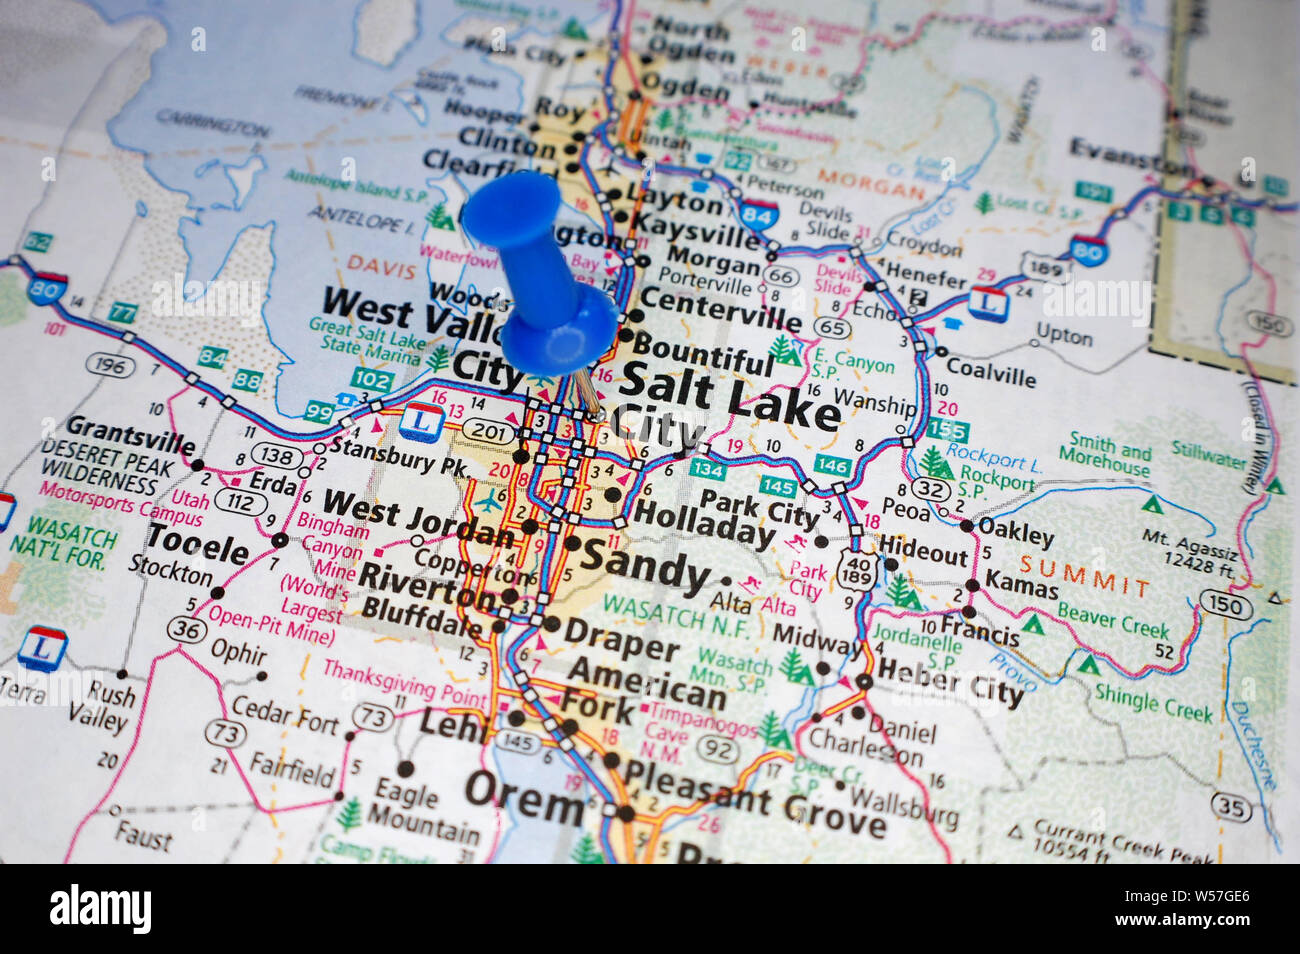 Salt Lake City Map Stockfotos & Salt Lake City Map Bilder ...